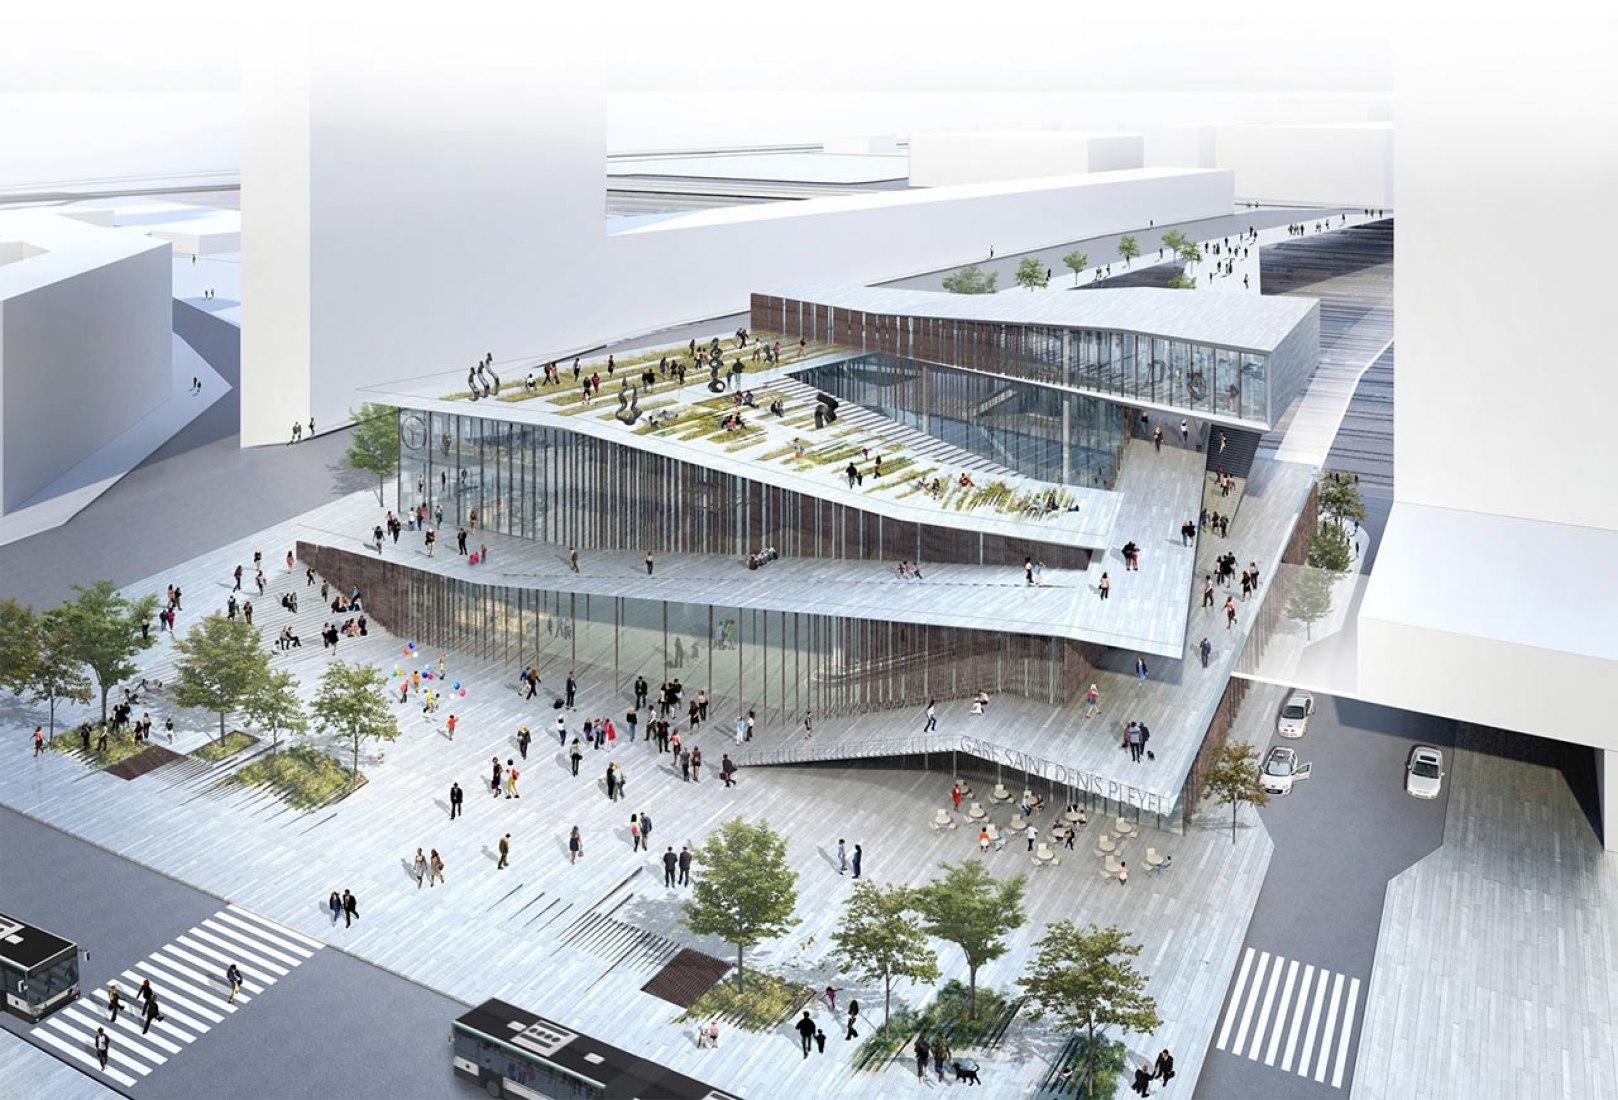 Overview. Saint-Denis Pleyel Emblematic Train Station por Kengo Kuma & Associates. Cortesía Kengo Kuma.